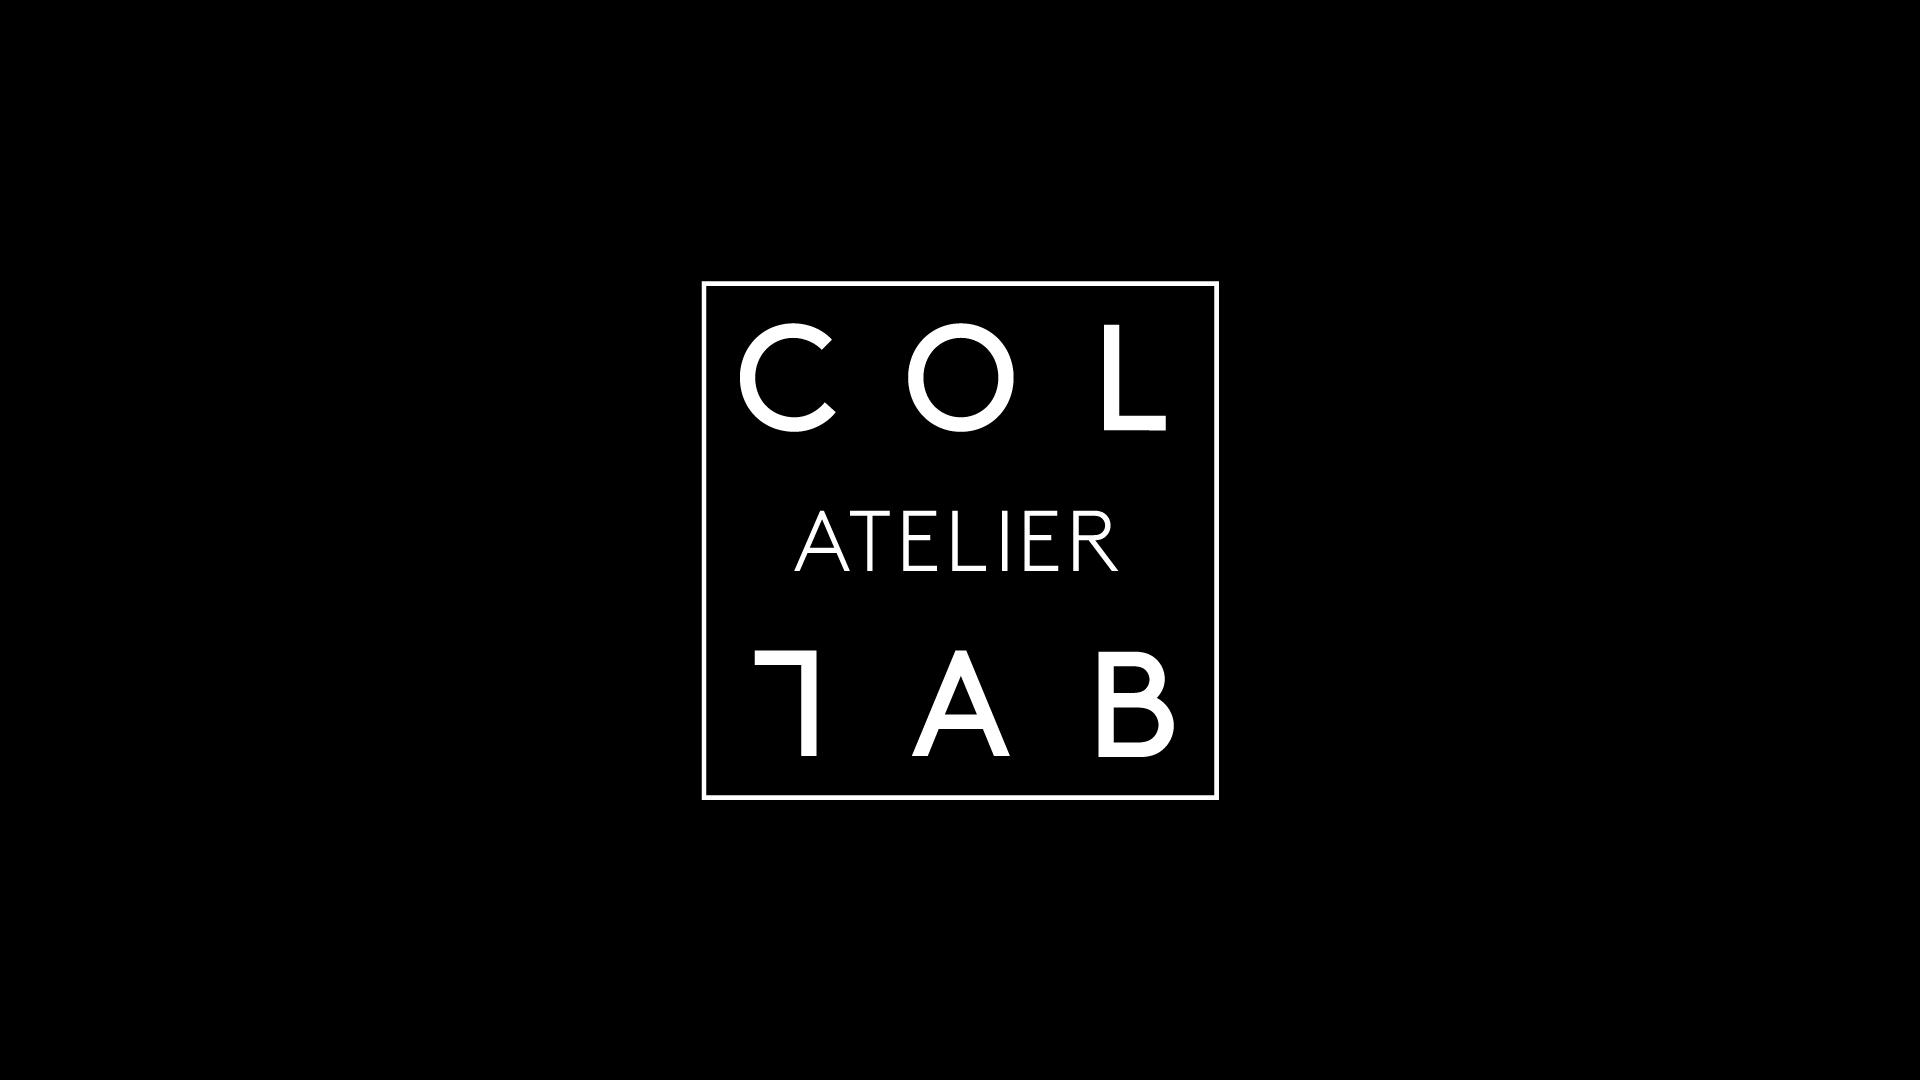 Atelier-collab-josselin-tourette-identite